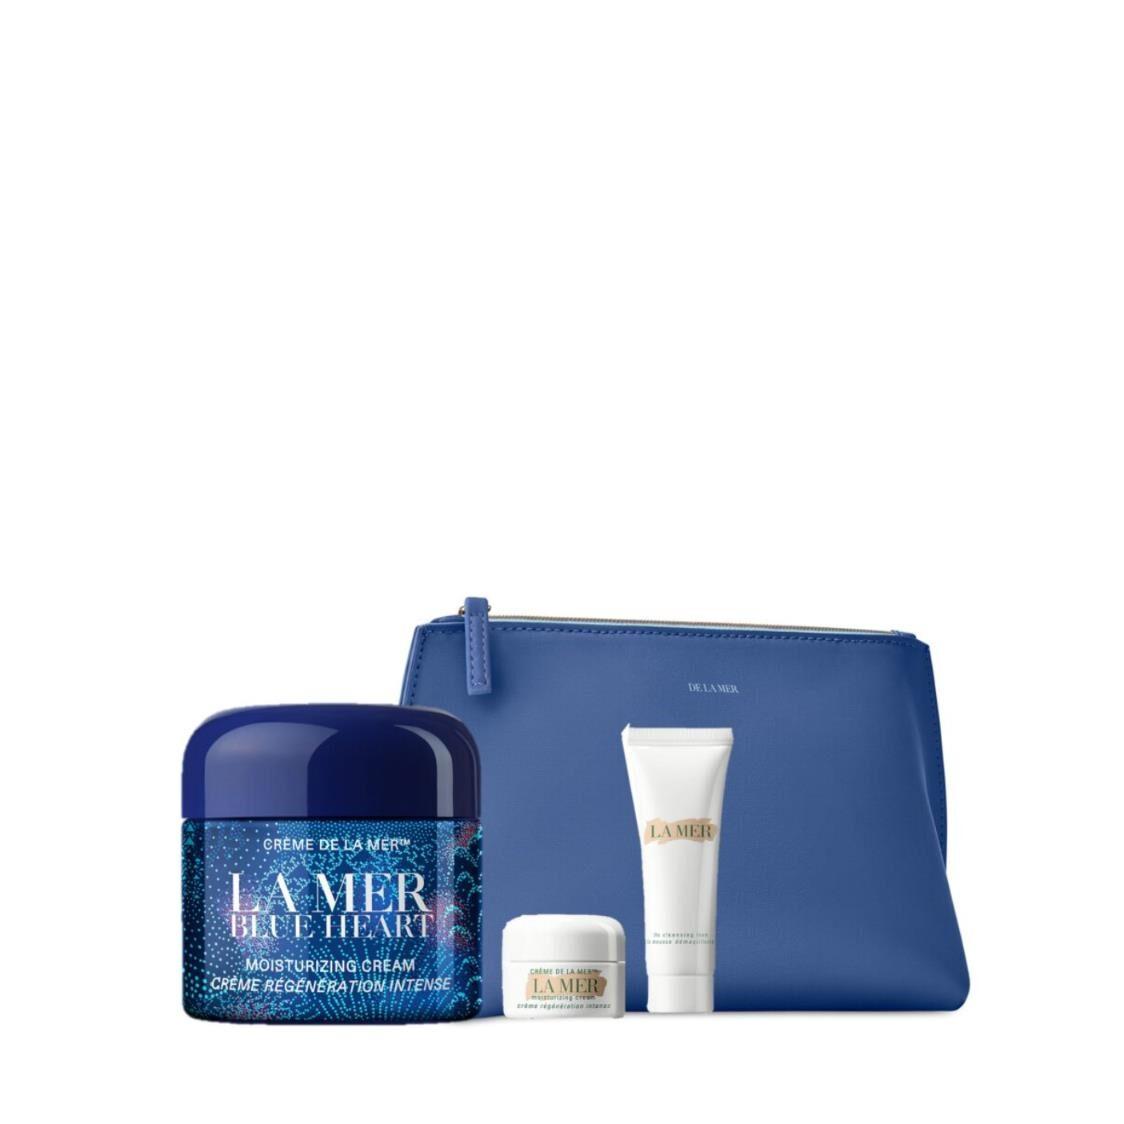 La Mer Limited-Edition Blue Heart Crme de la Mer 60ml worth 696